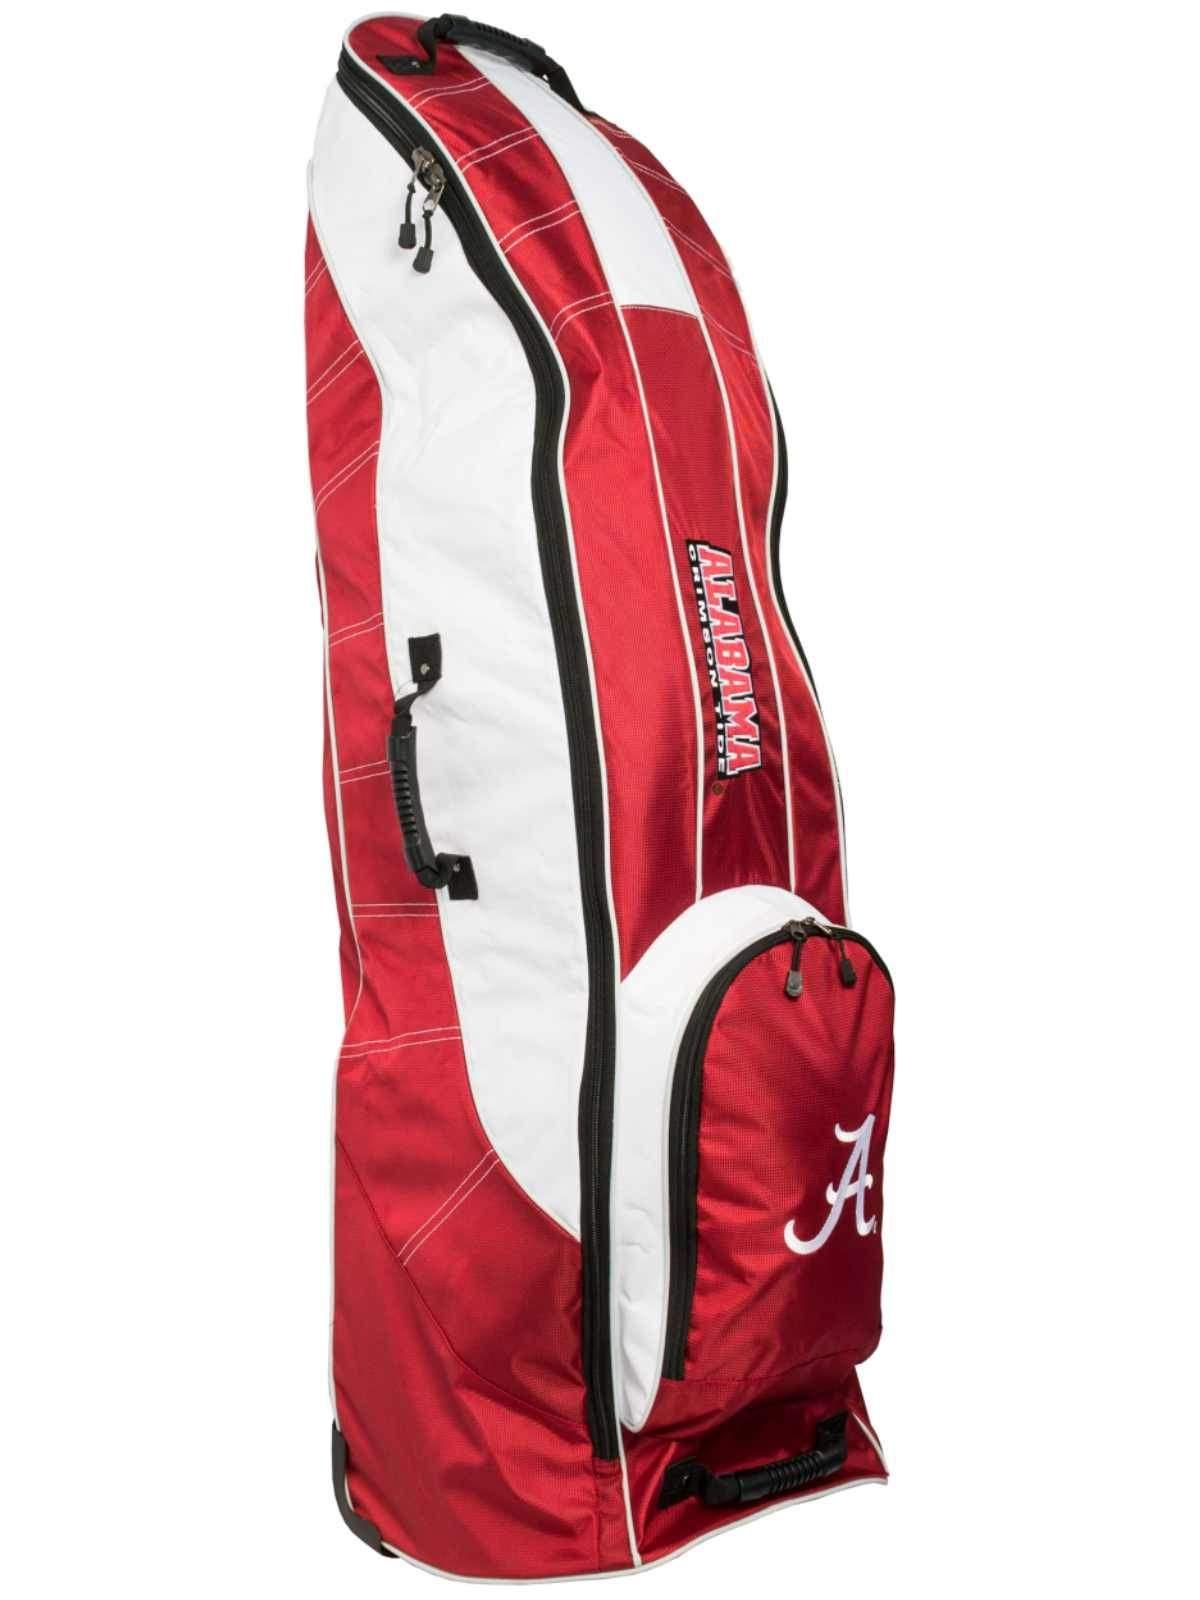 Alabama Crimson Tide Team Golf Red Golf Clubs Wheeled Luggage Travel Bag 2cec9e98ed